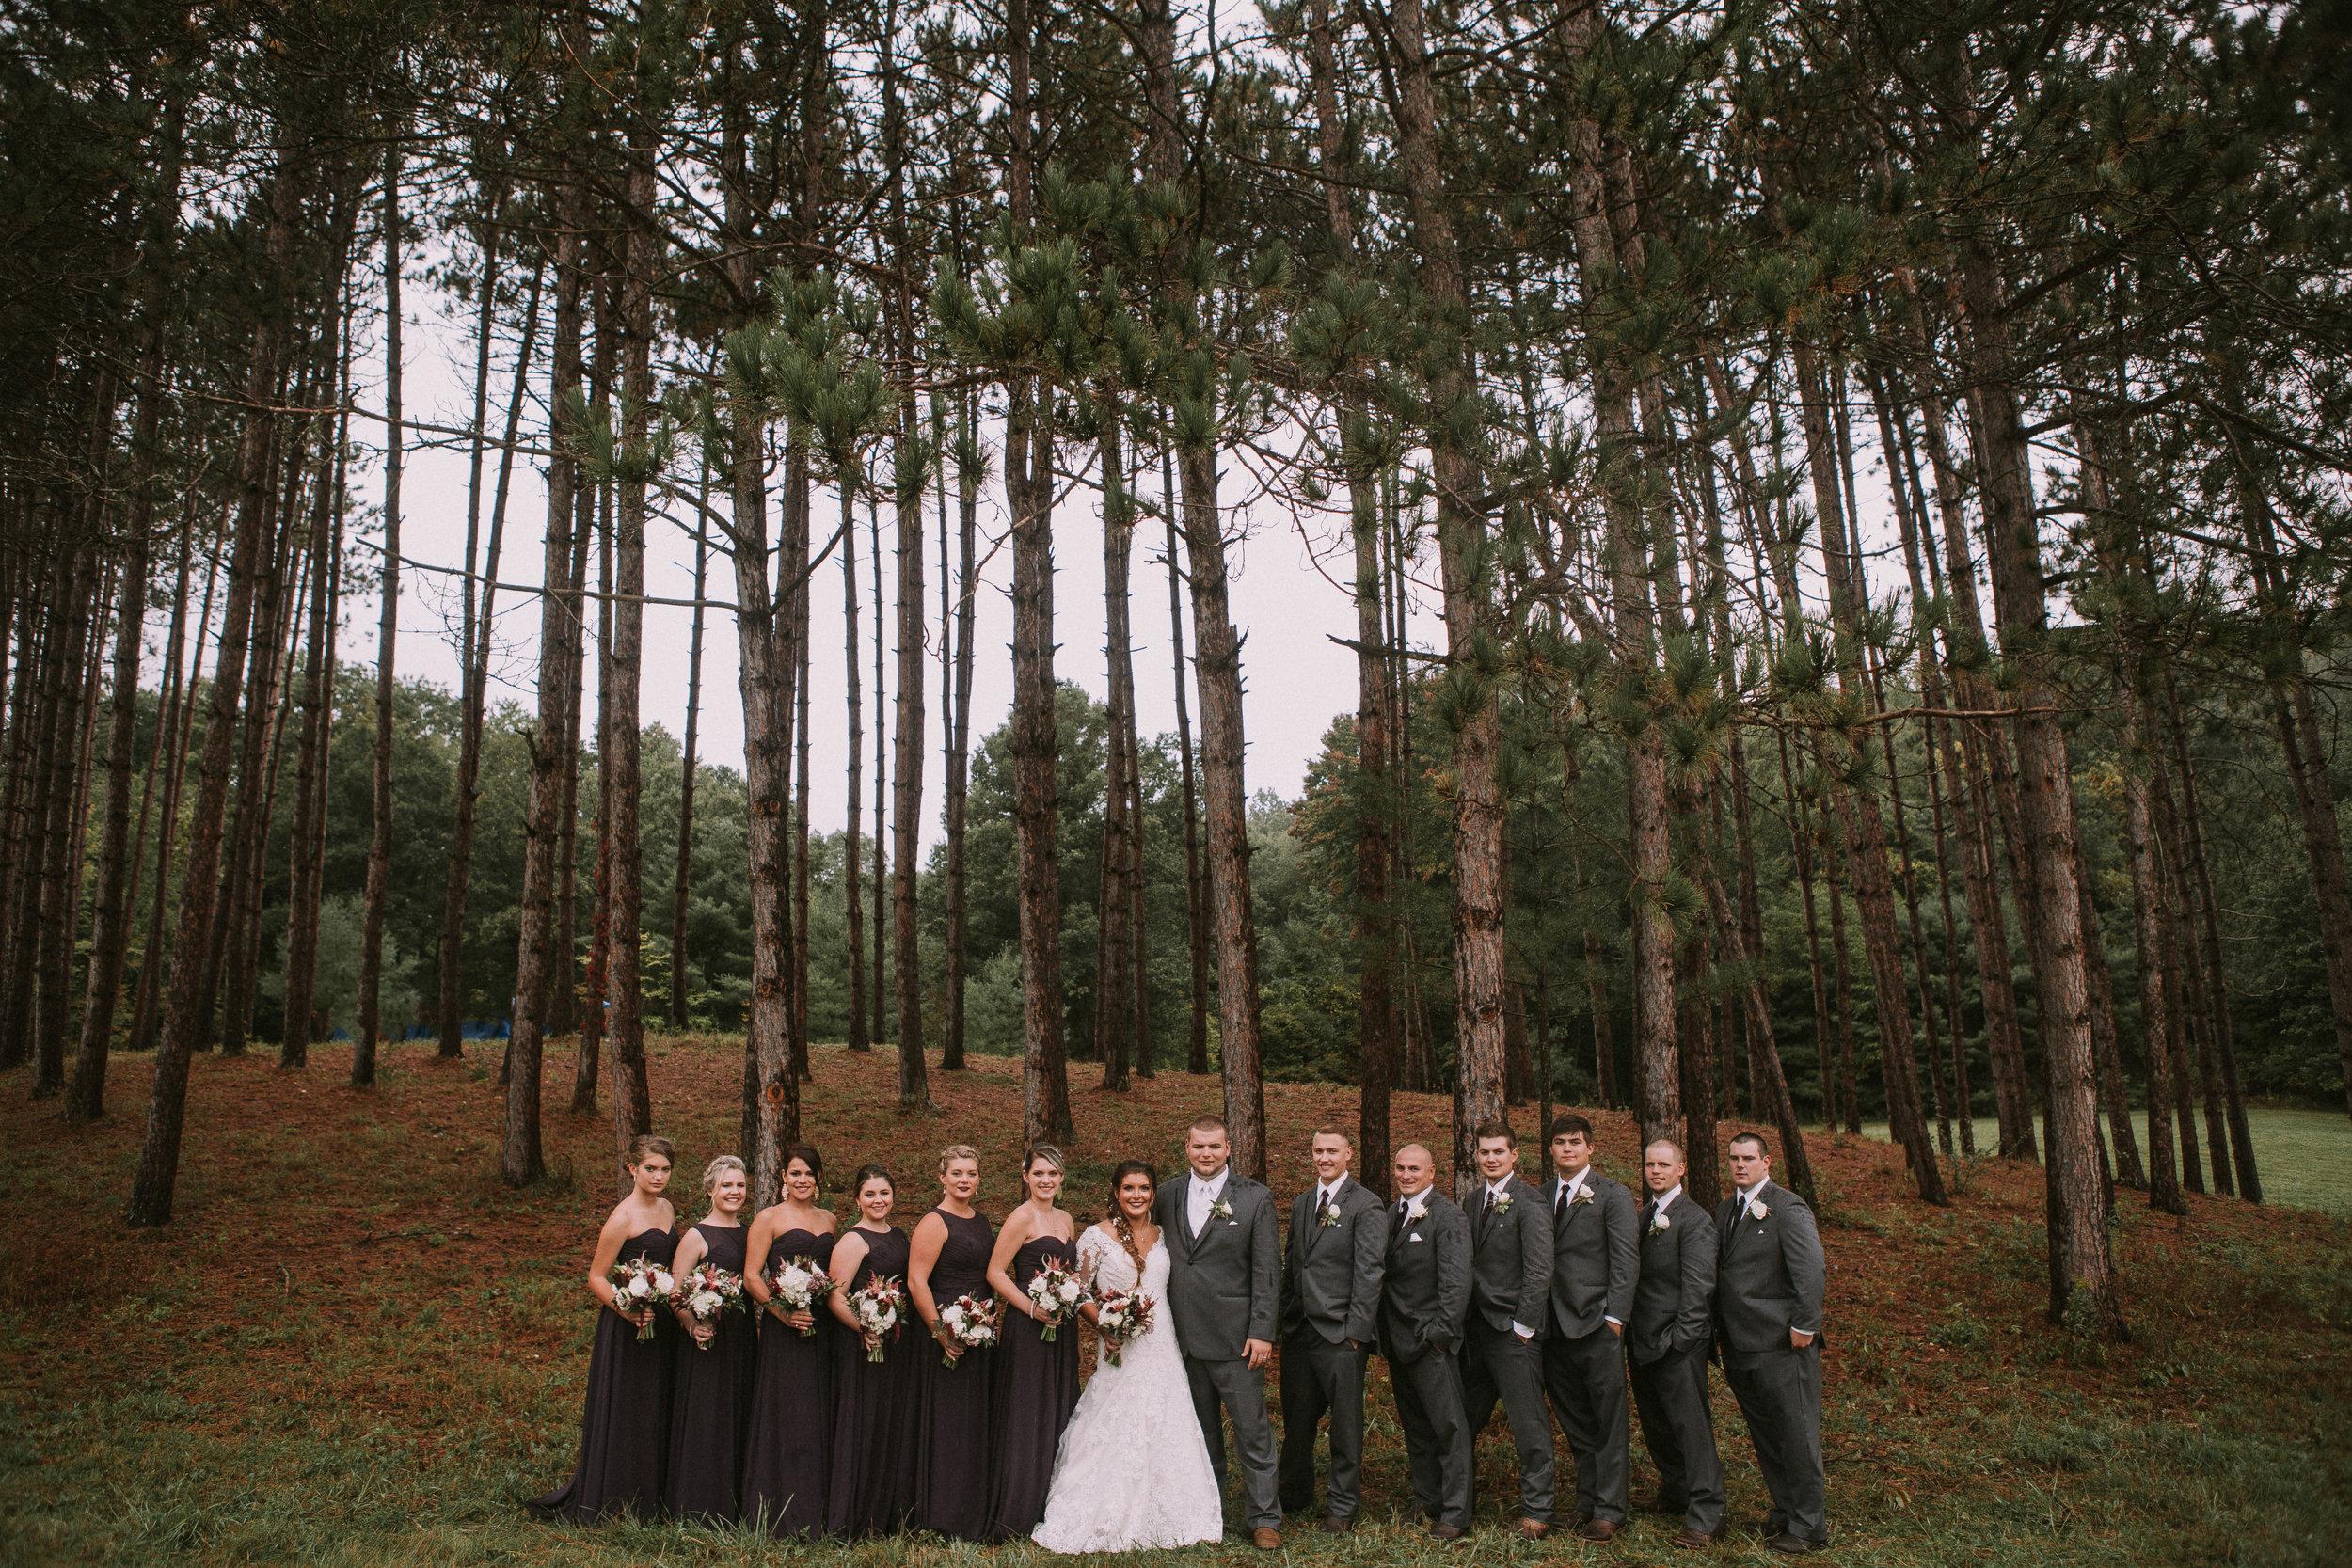 Parker Wedding20161001_0706 copy.jpg